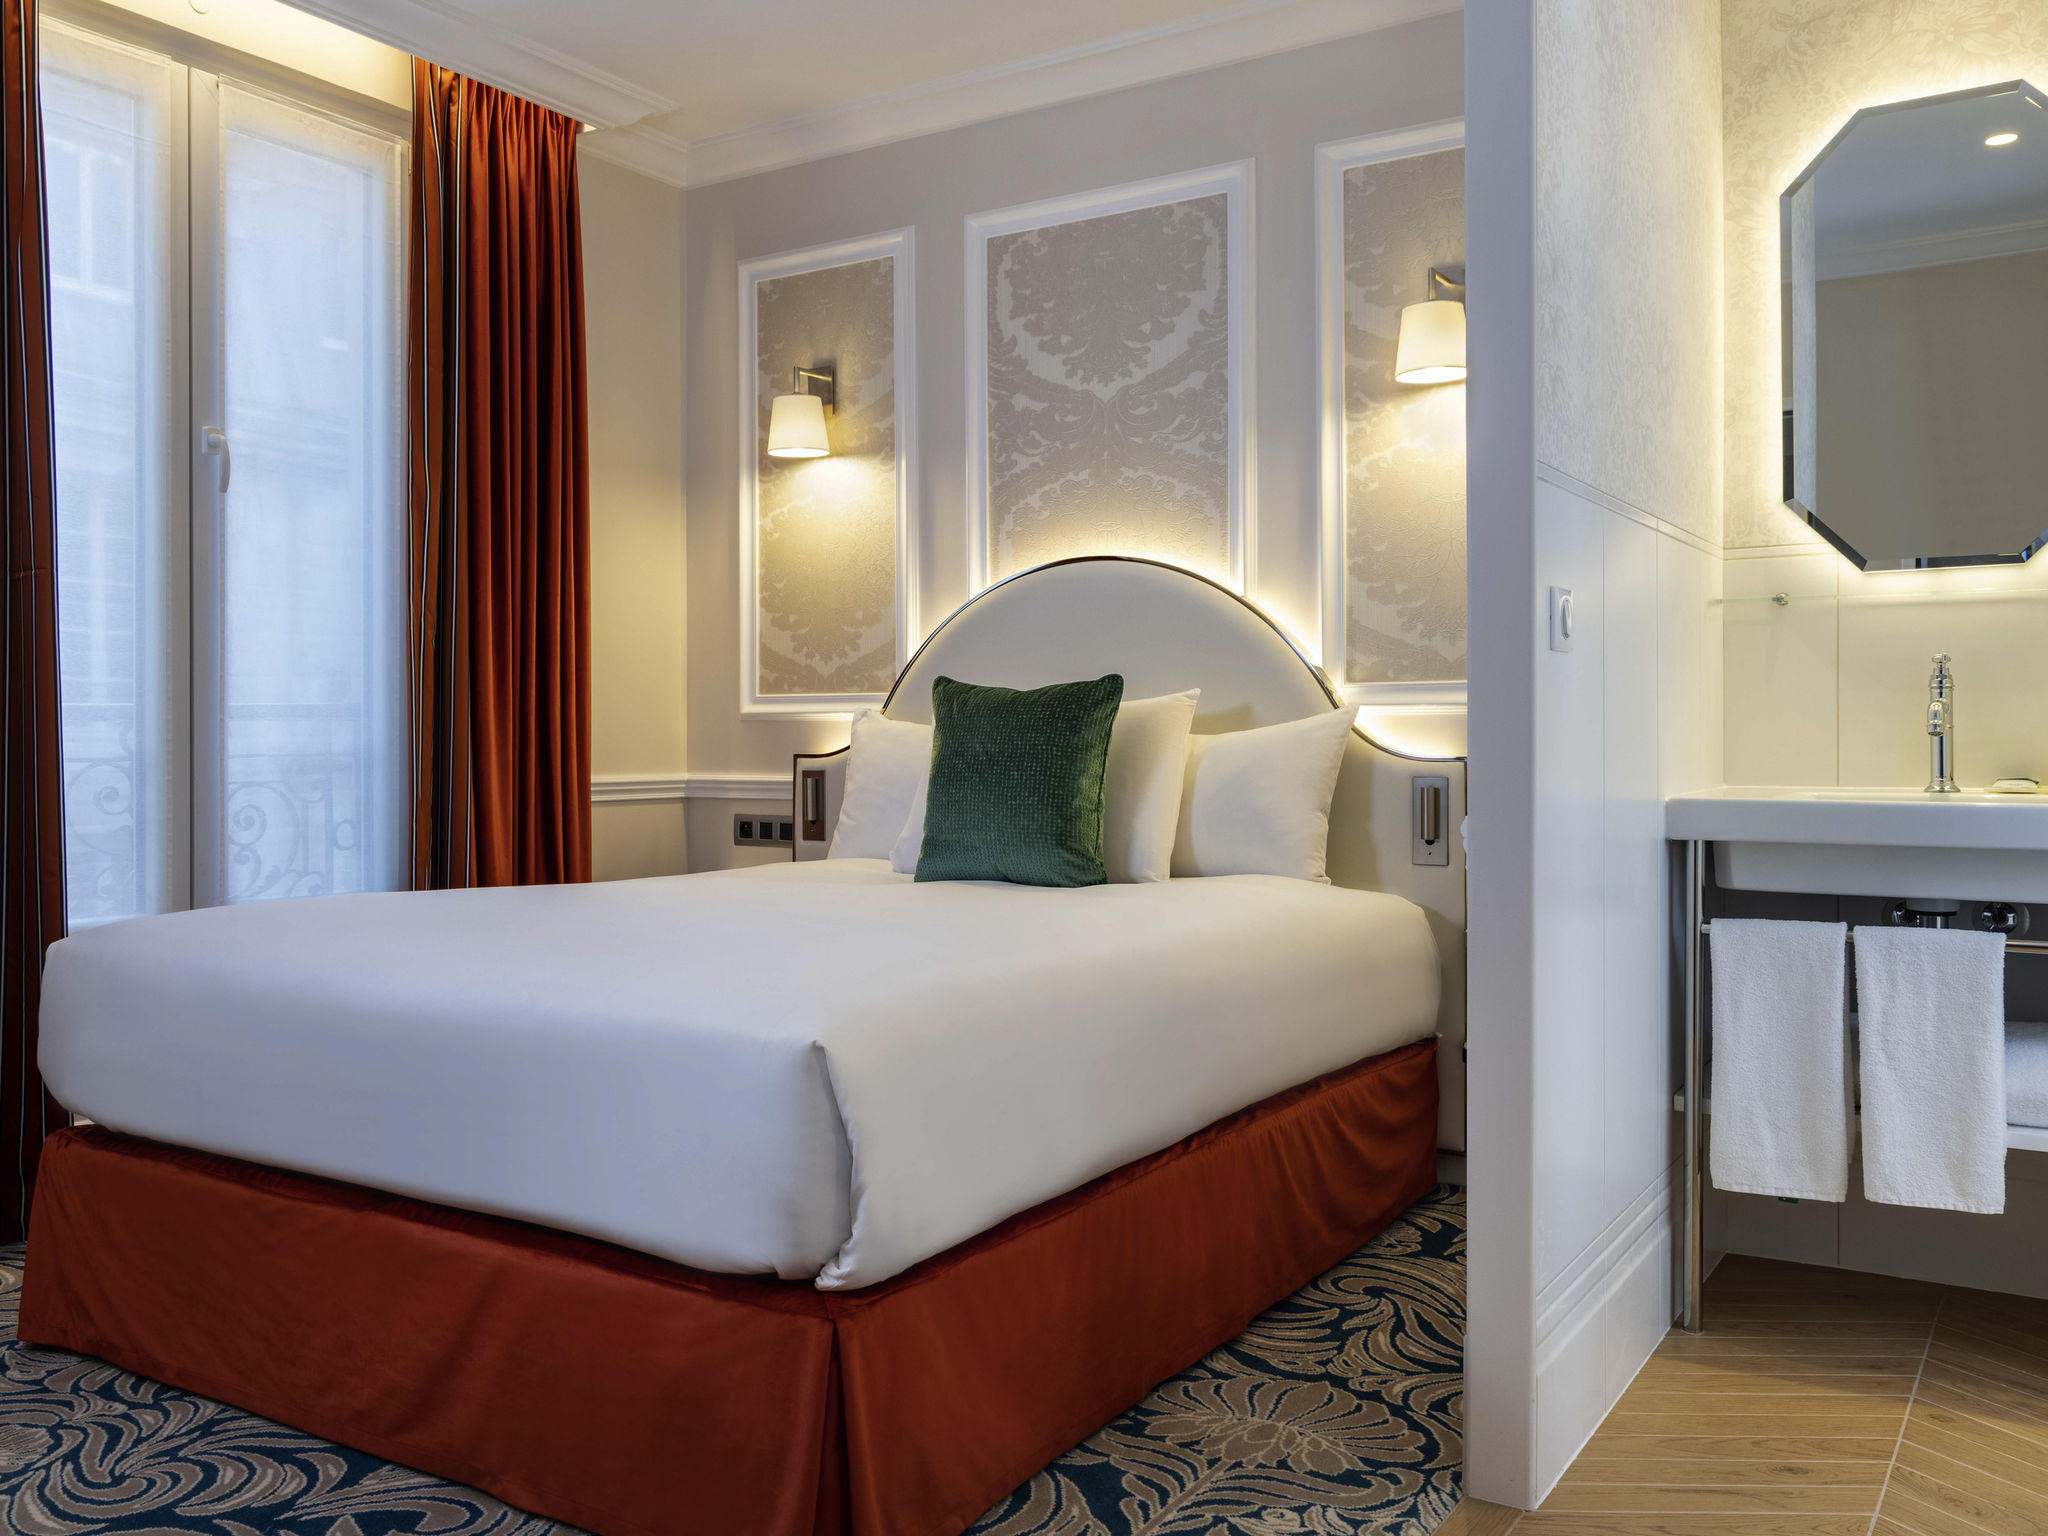 فندق - مركيور Mercure باريس لا سوربون